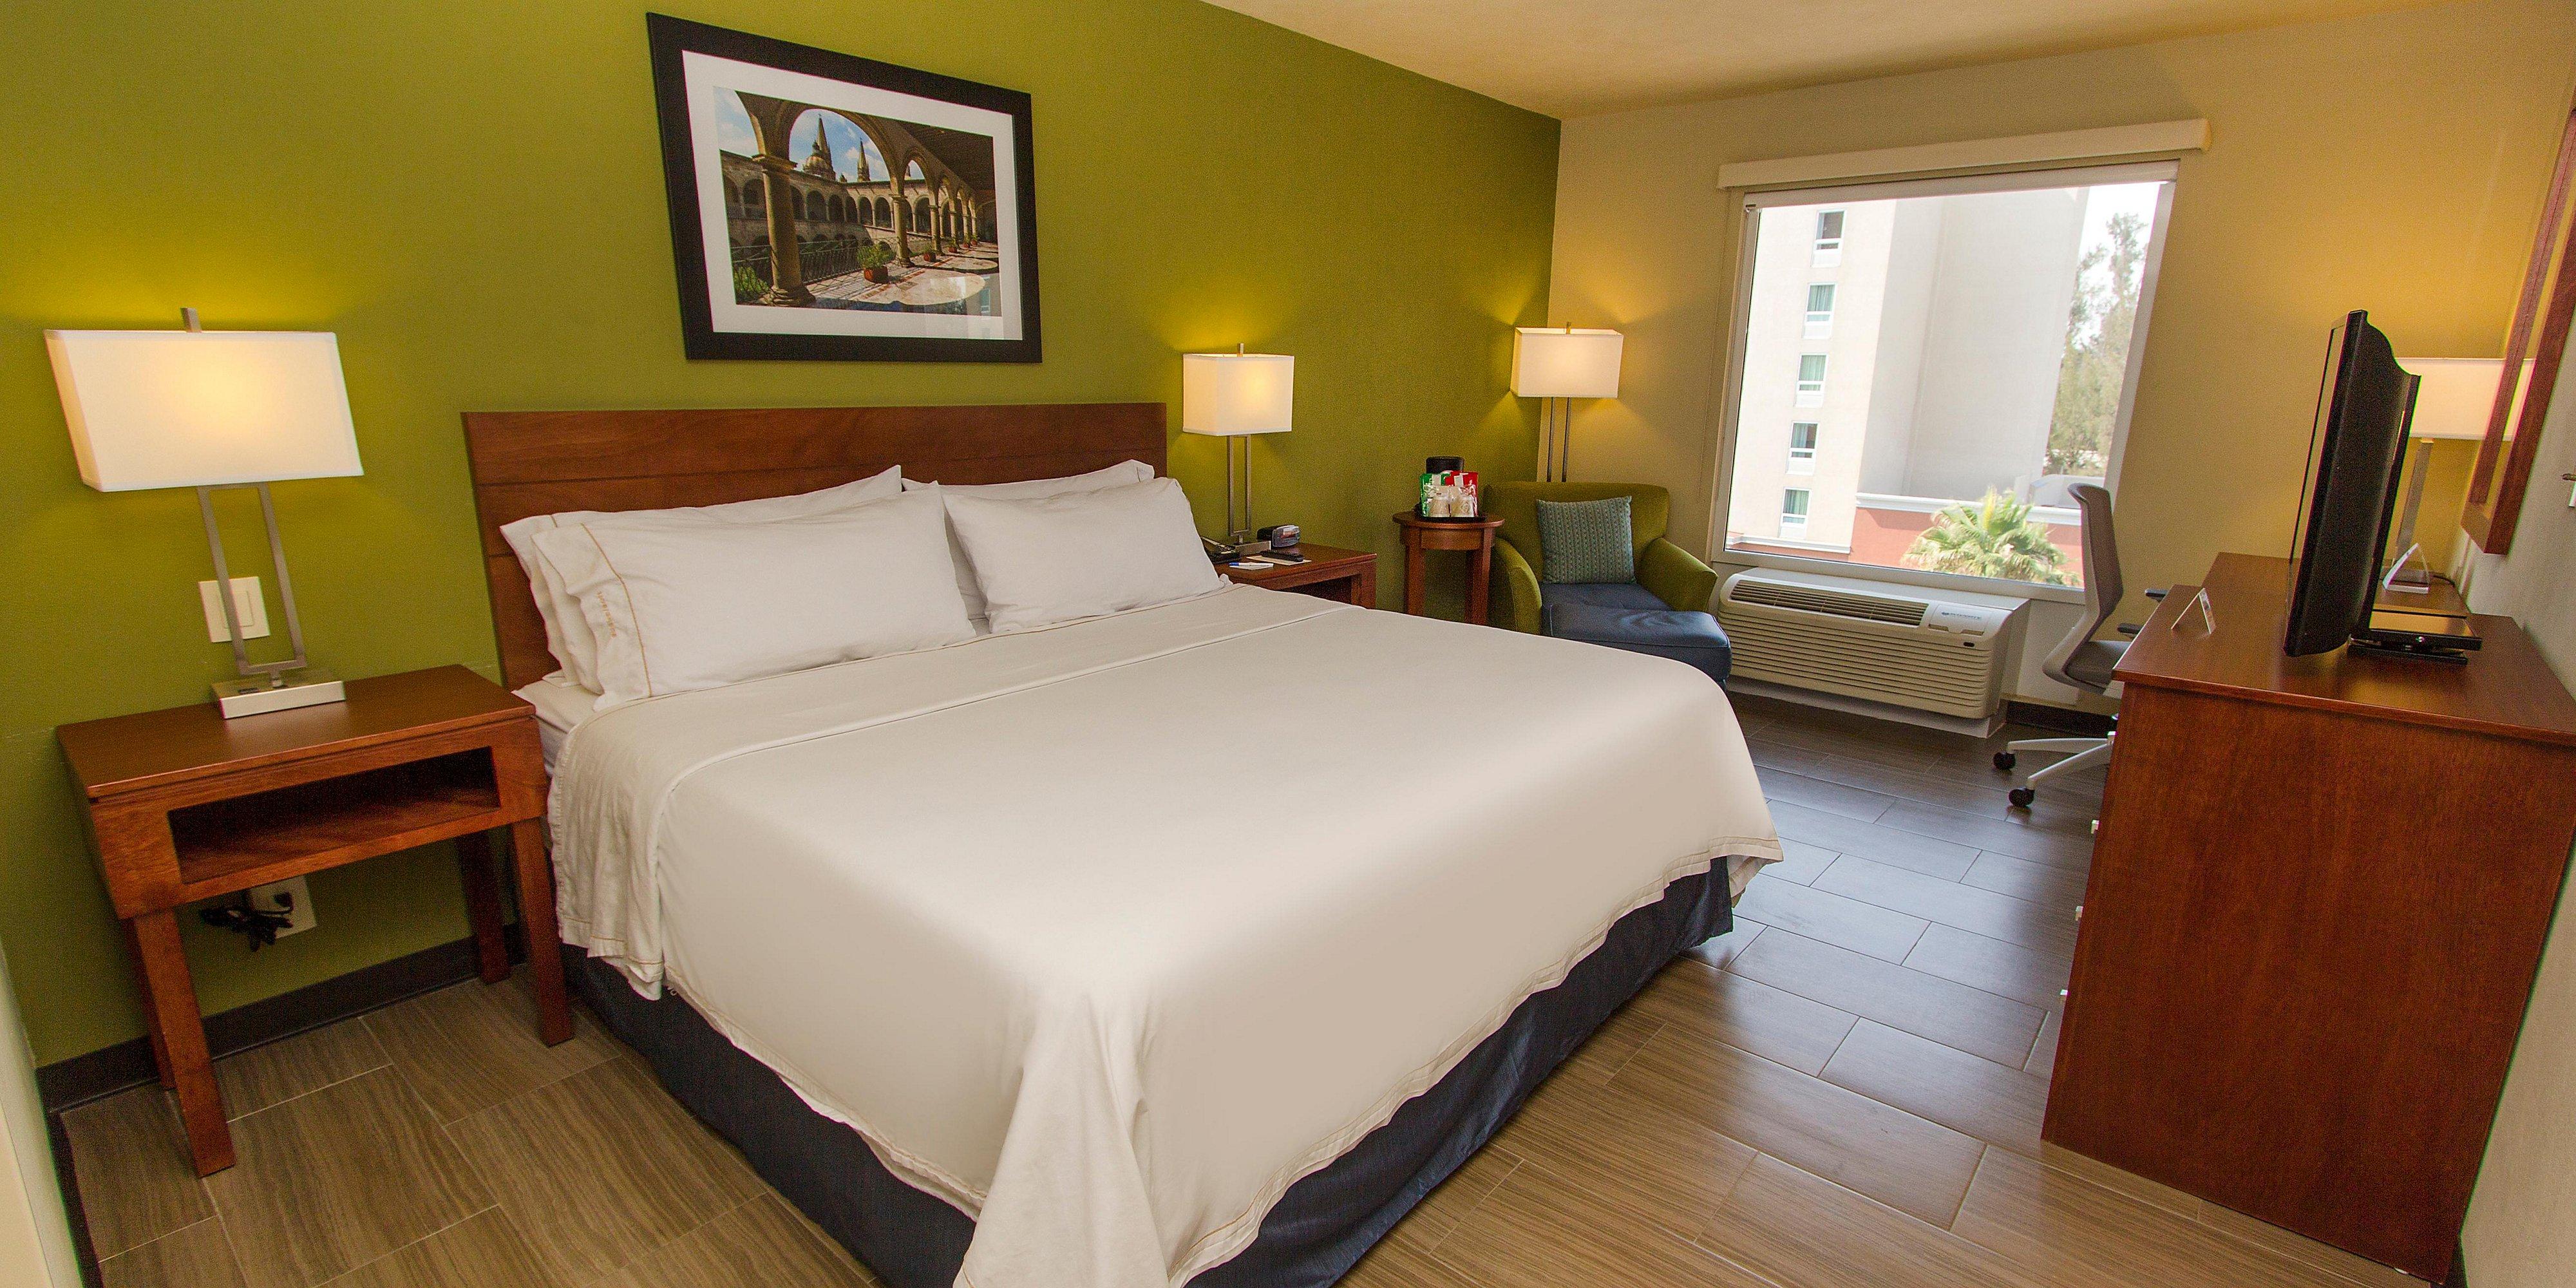 Holiday Inn Express Guadalajara 4605504437 2x1